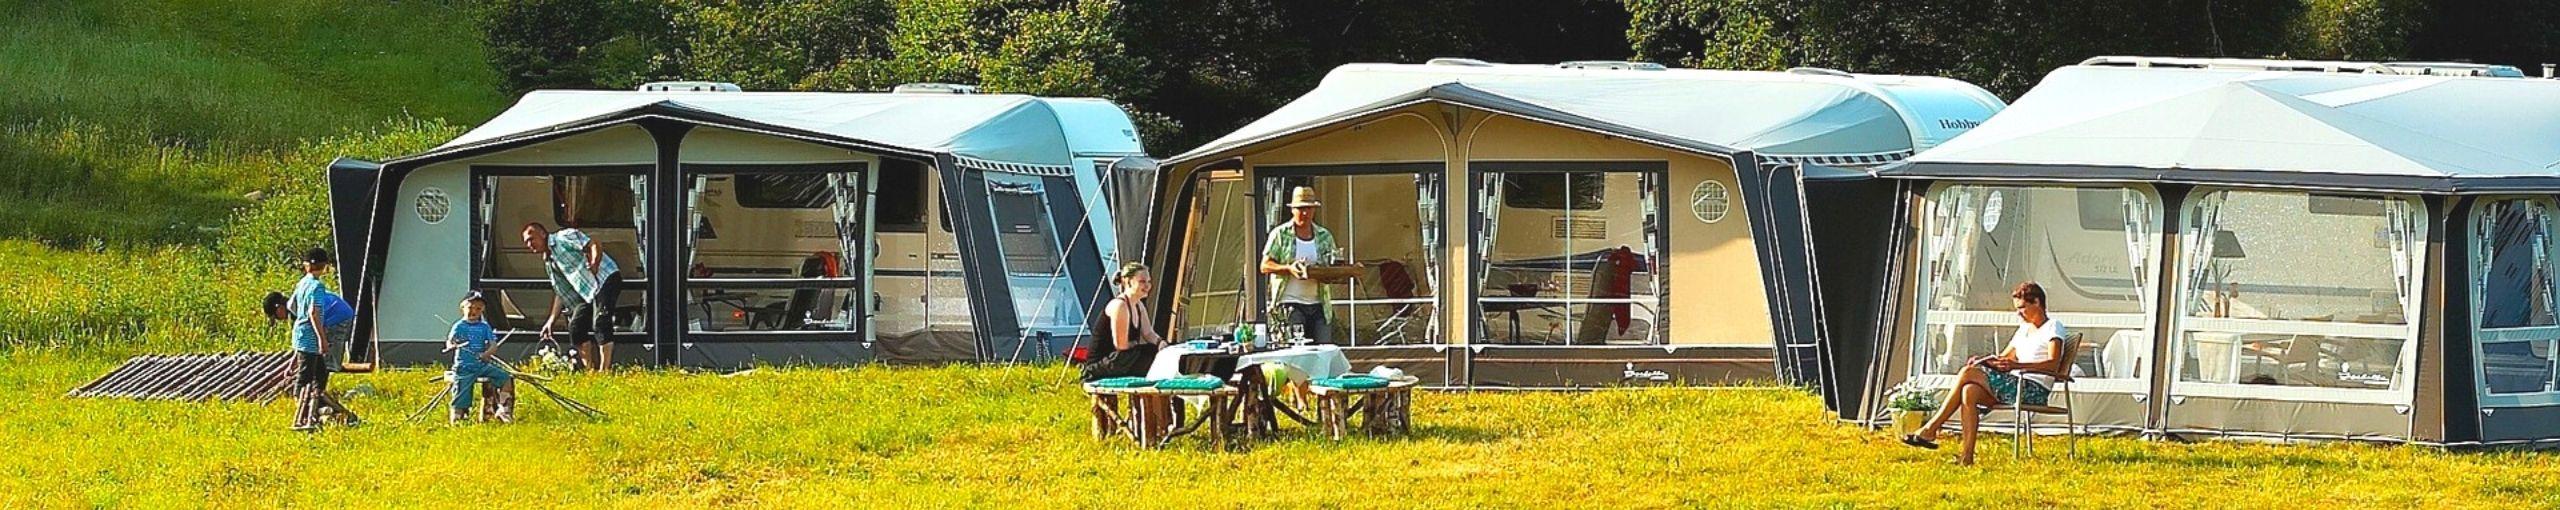 Guía Camping del País Vasco. Euskadi.